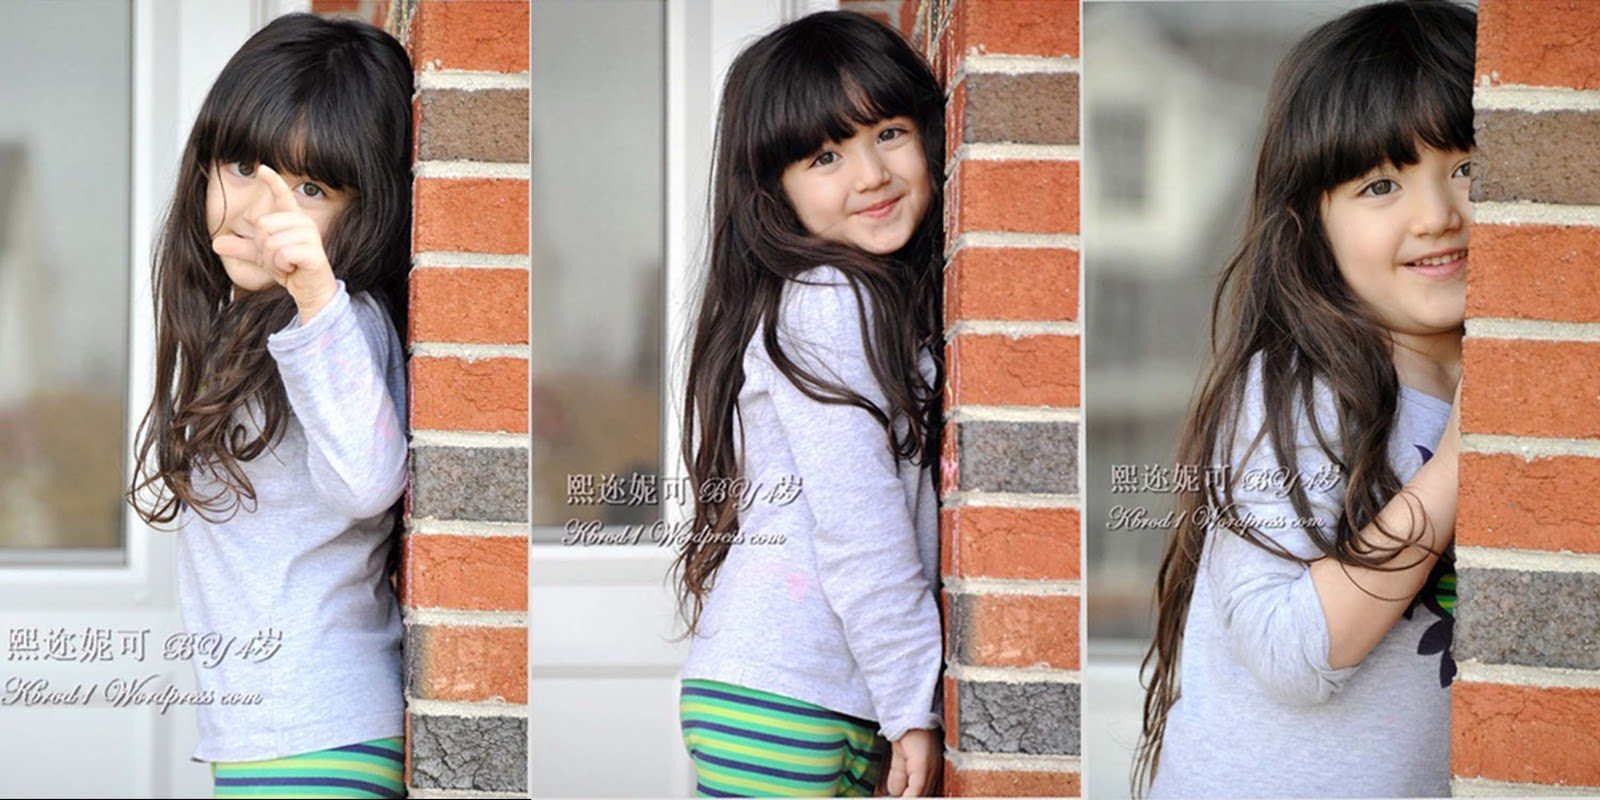 Kenneth Nicole Brodsky Gadis Kecil Tercantik Di Dunia Berita